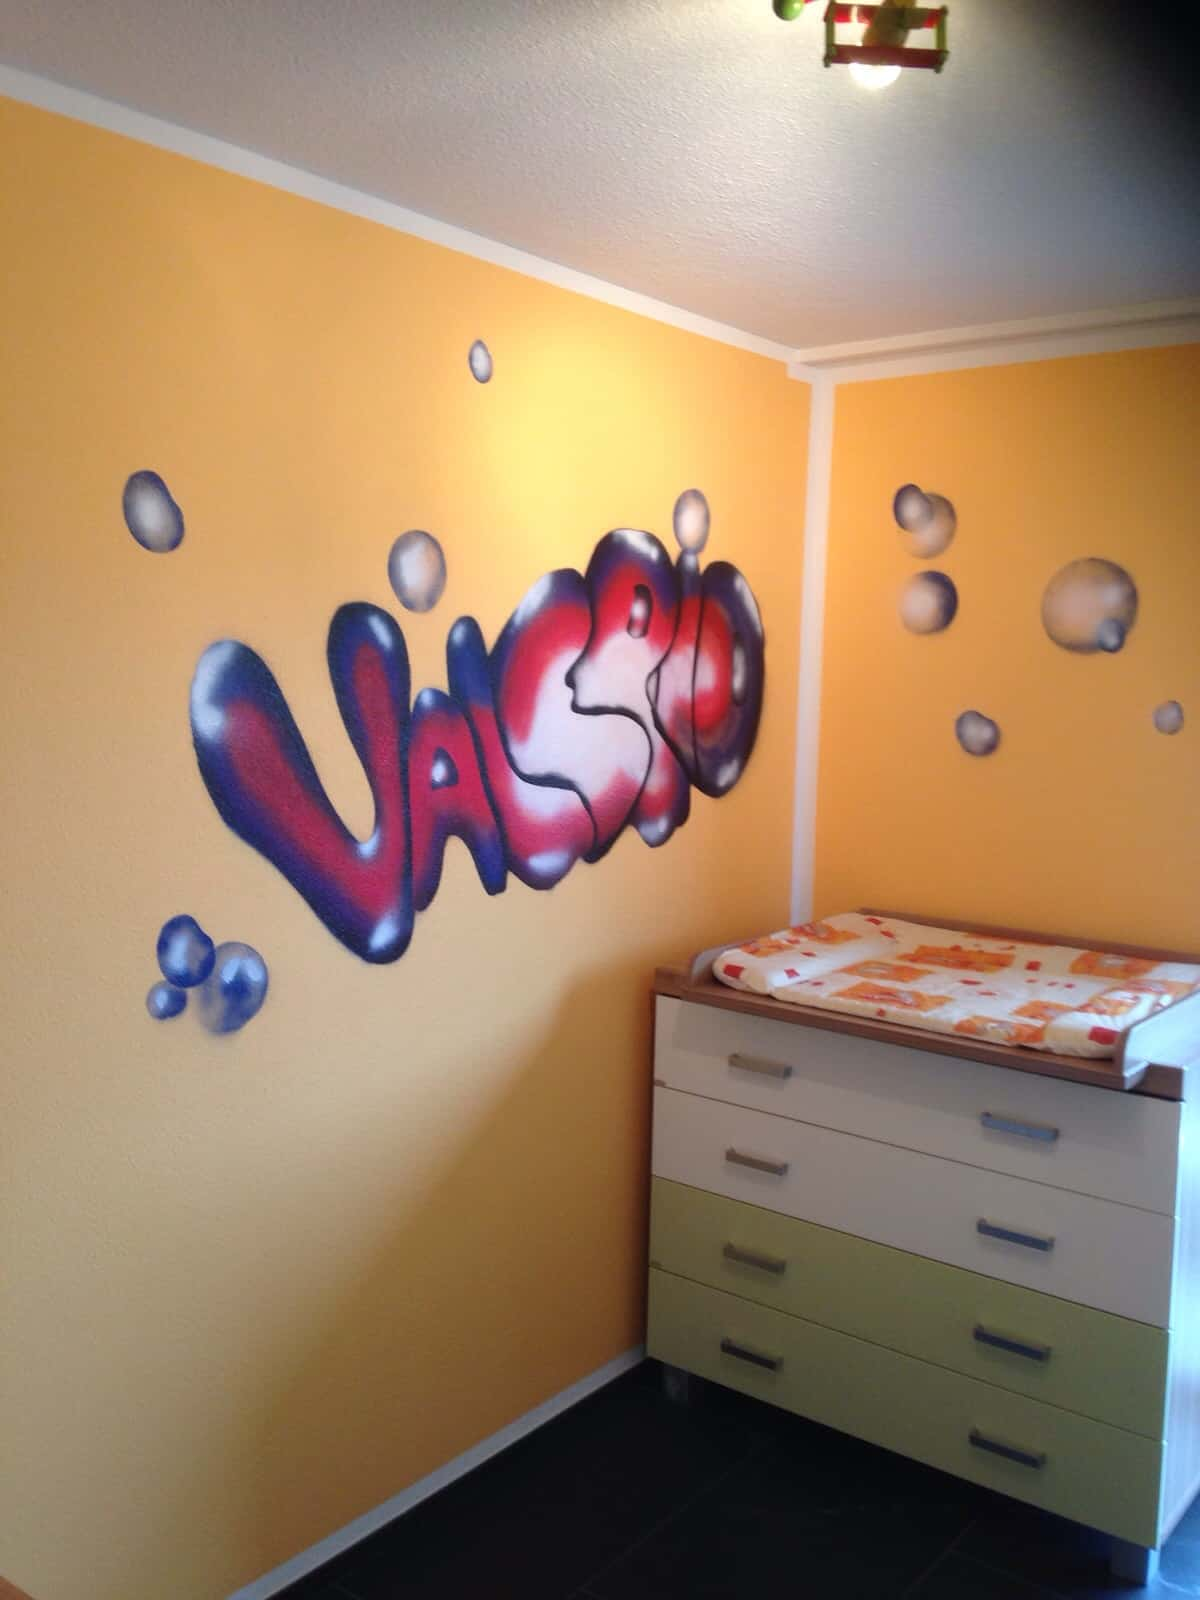 Strassenkunst im Kinderzimmer - Massimo Color